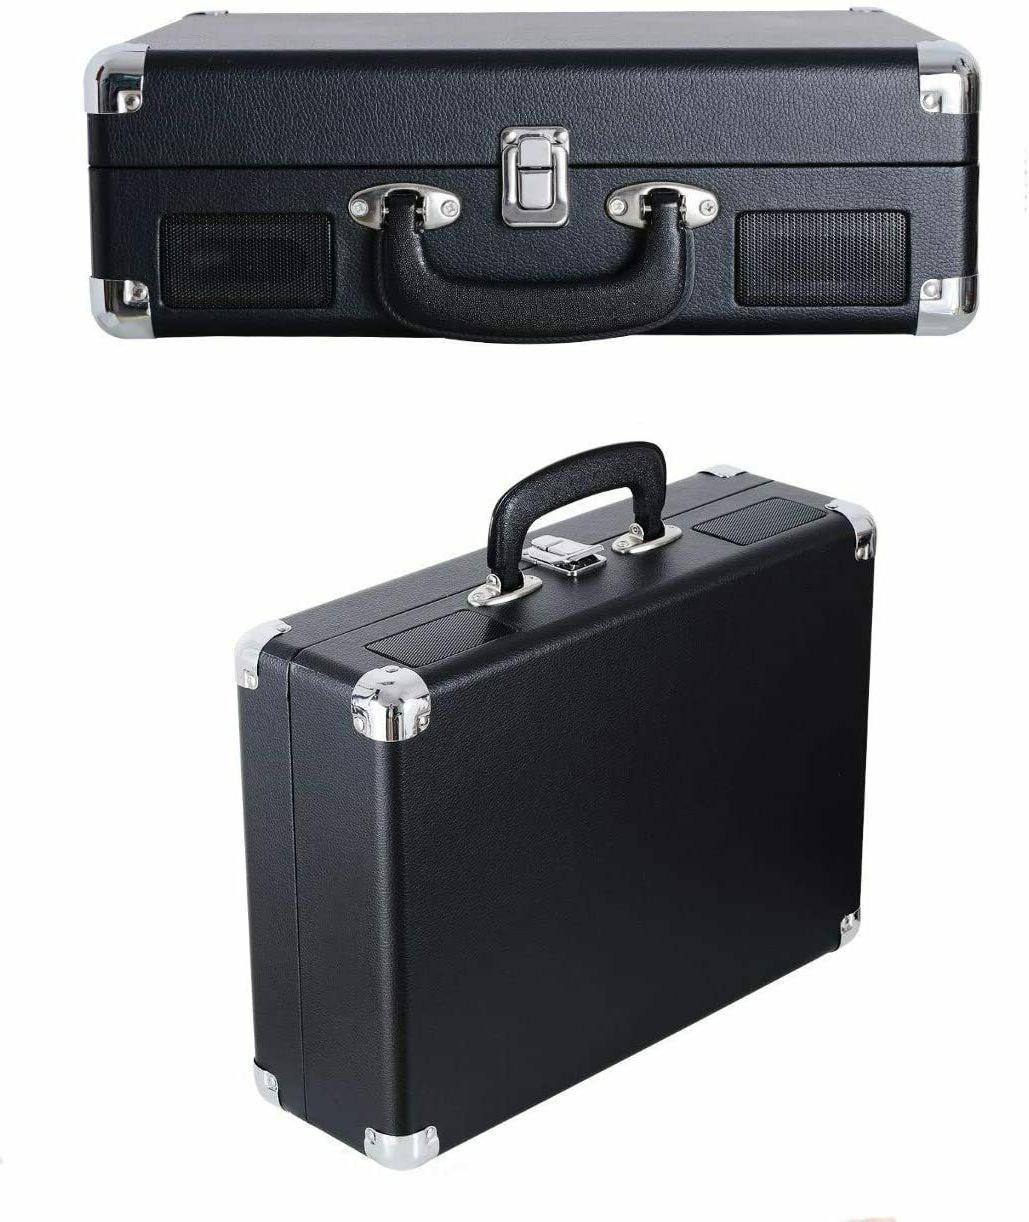 Jorlai Musitrend Turntable Portable Built-in Speakers